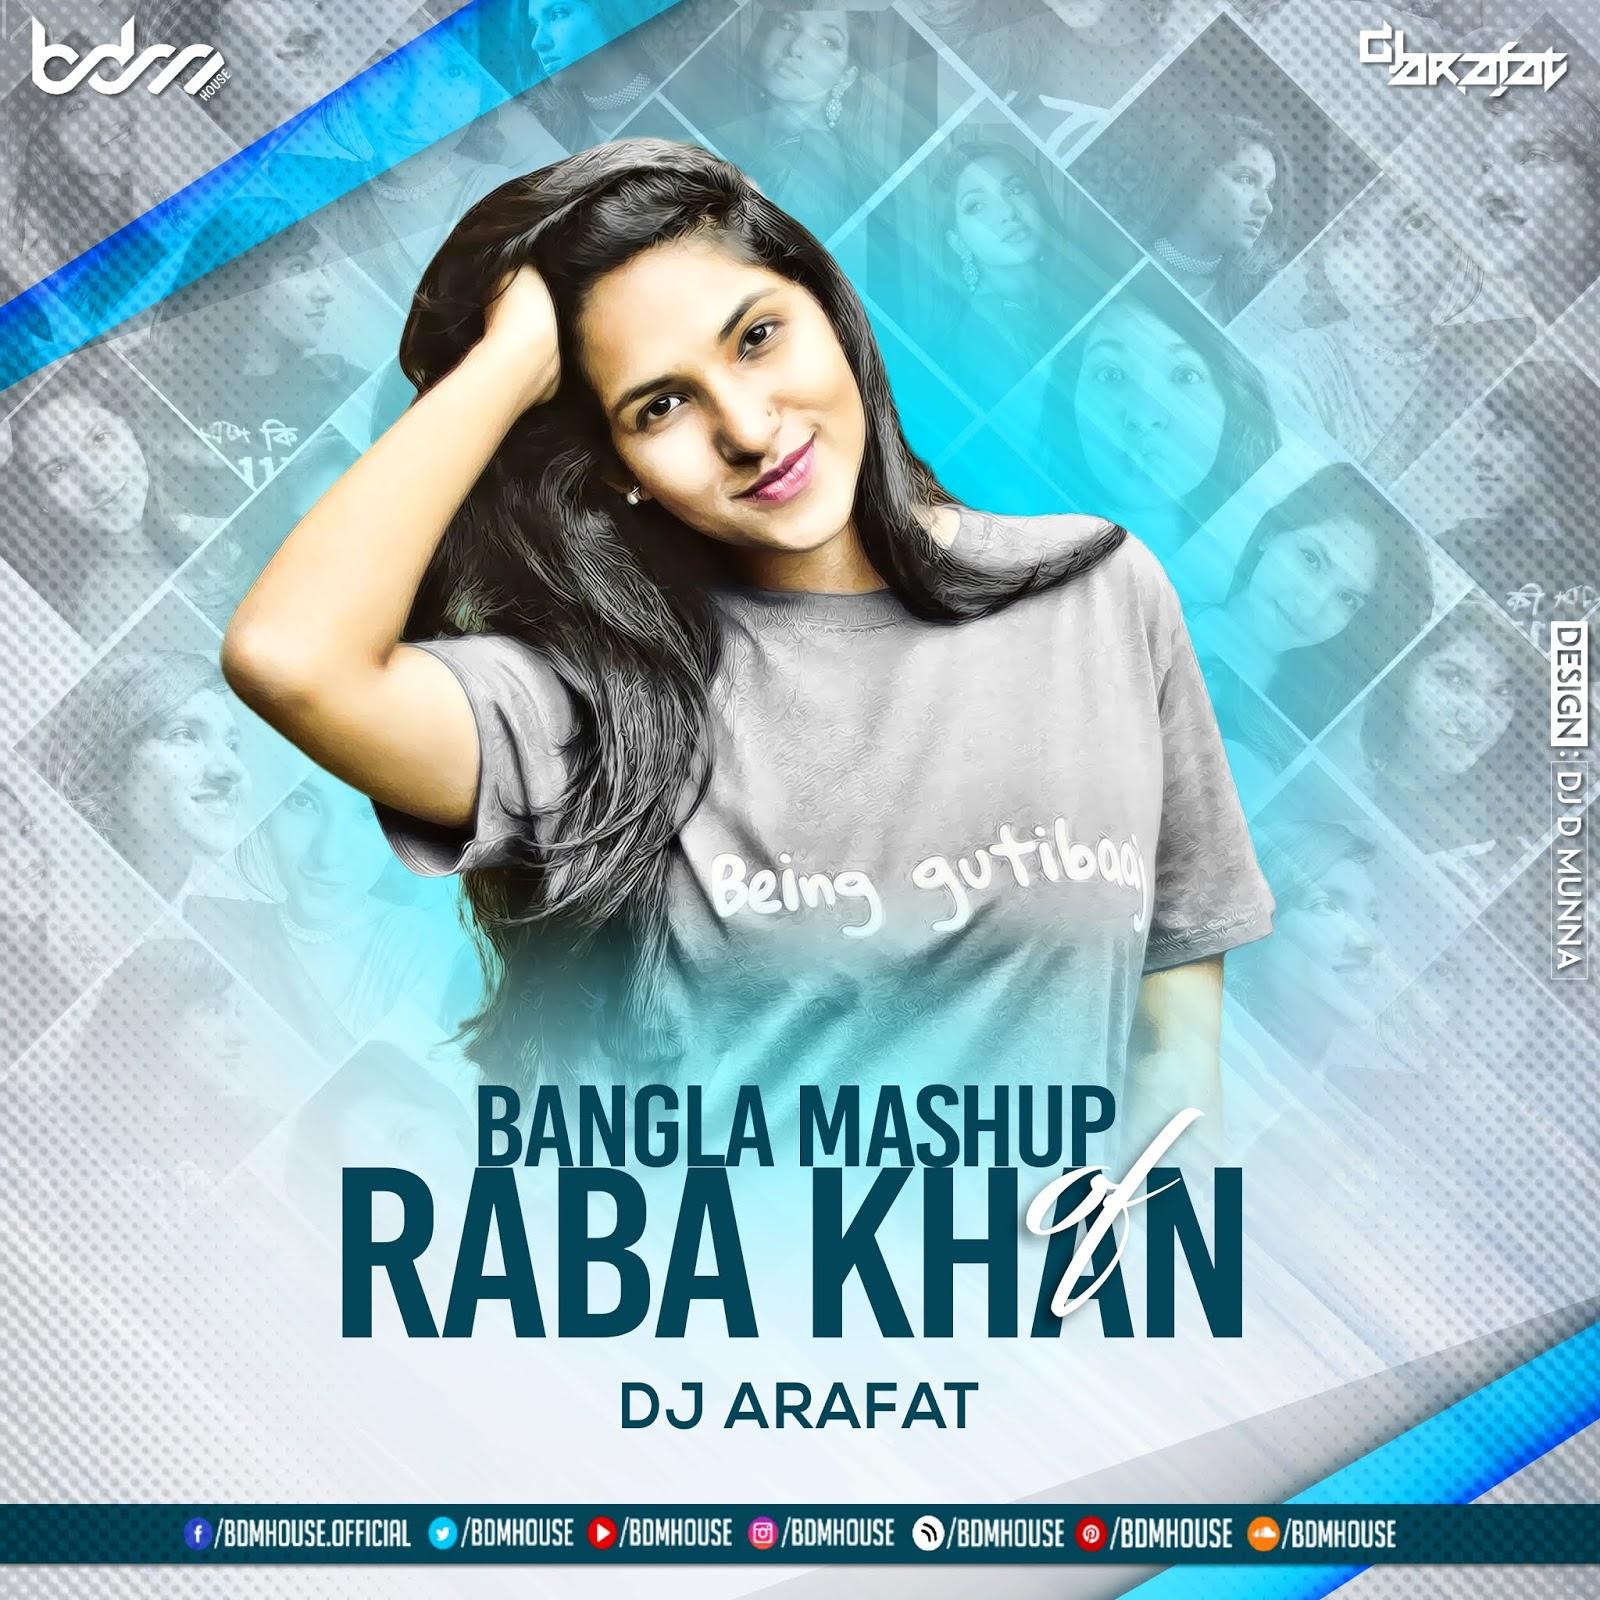 BANGLA MASHUP OF RABA KHAN - DJ ARAFAT ( BDDJSMUSIC.COM )